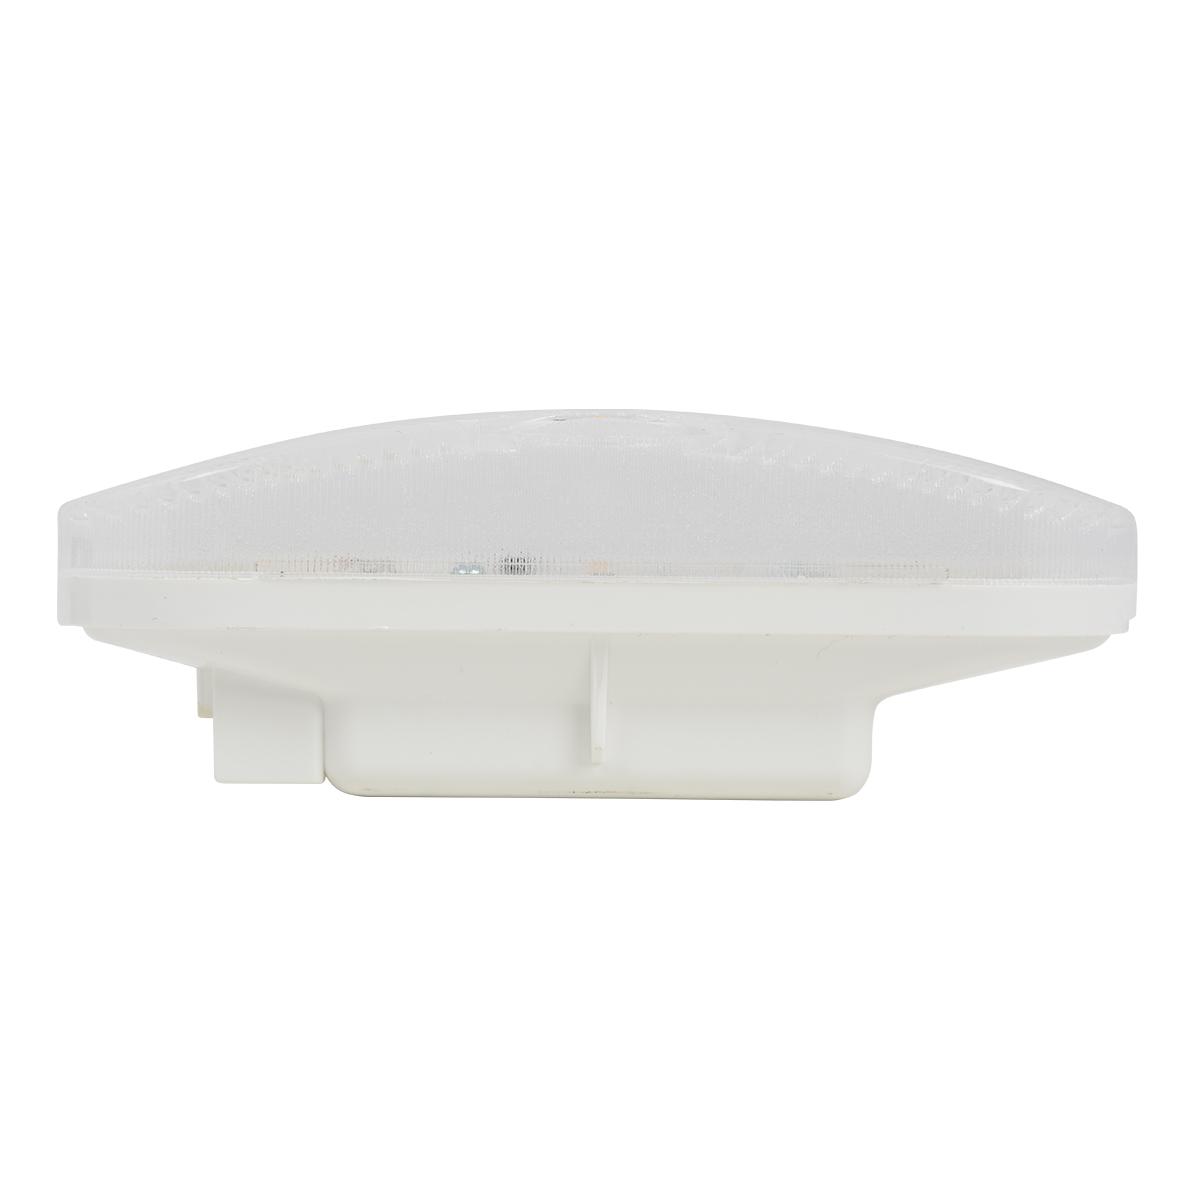 75852 Oval Single High Power LED Sealed Light